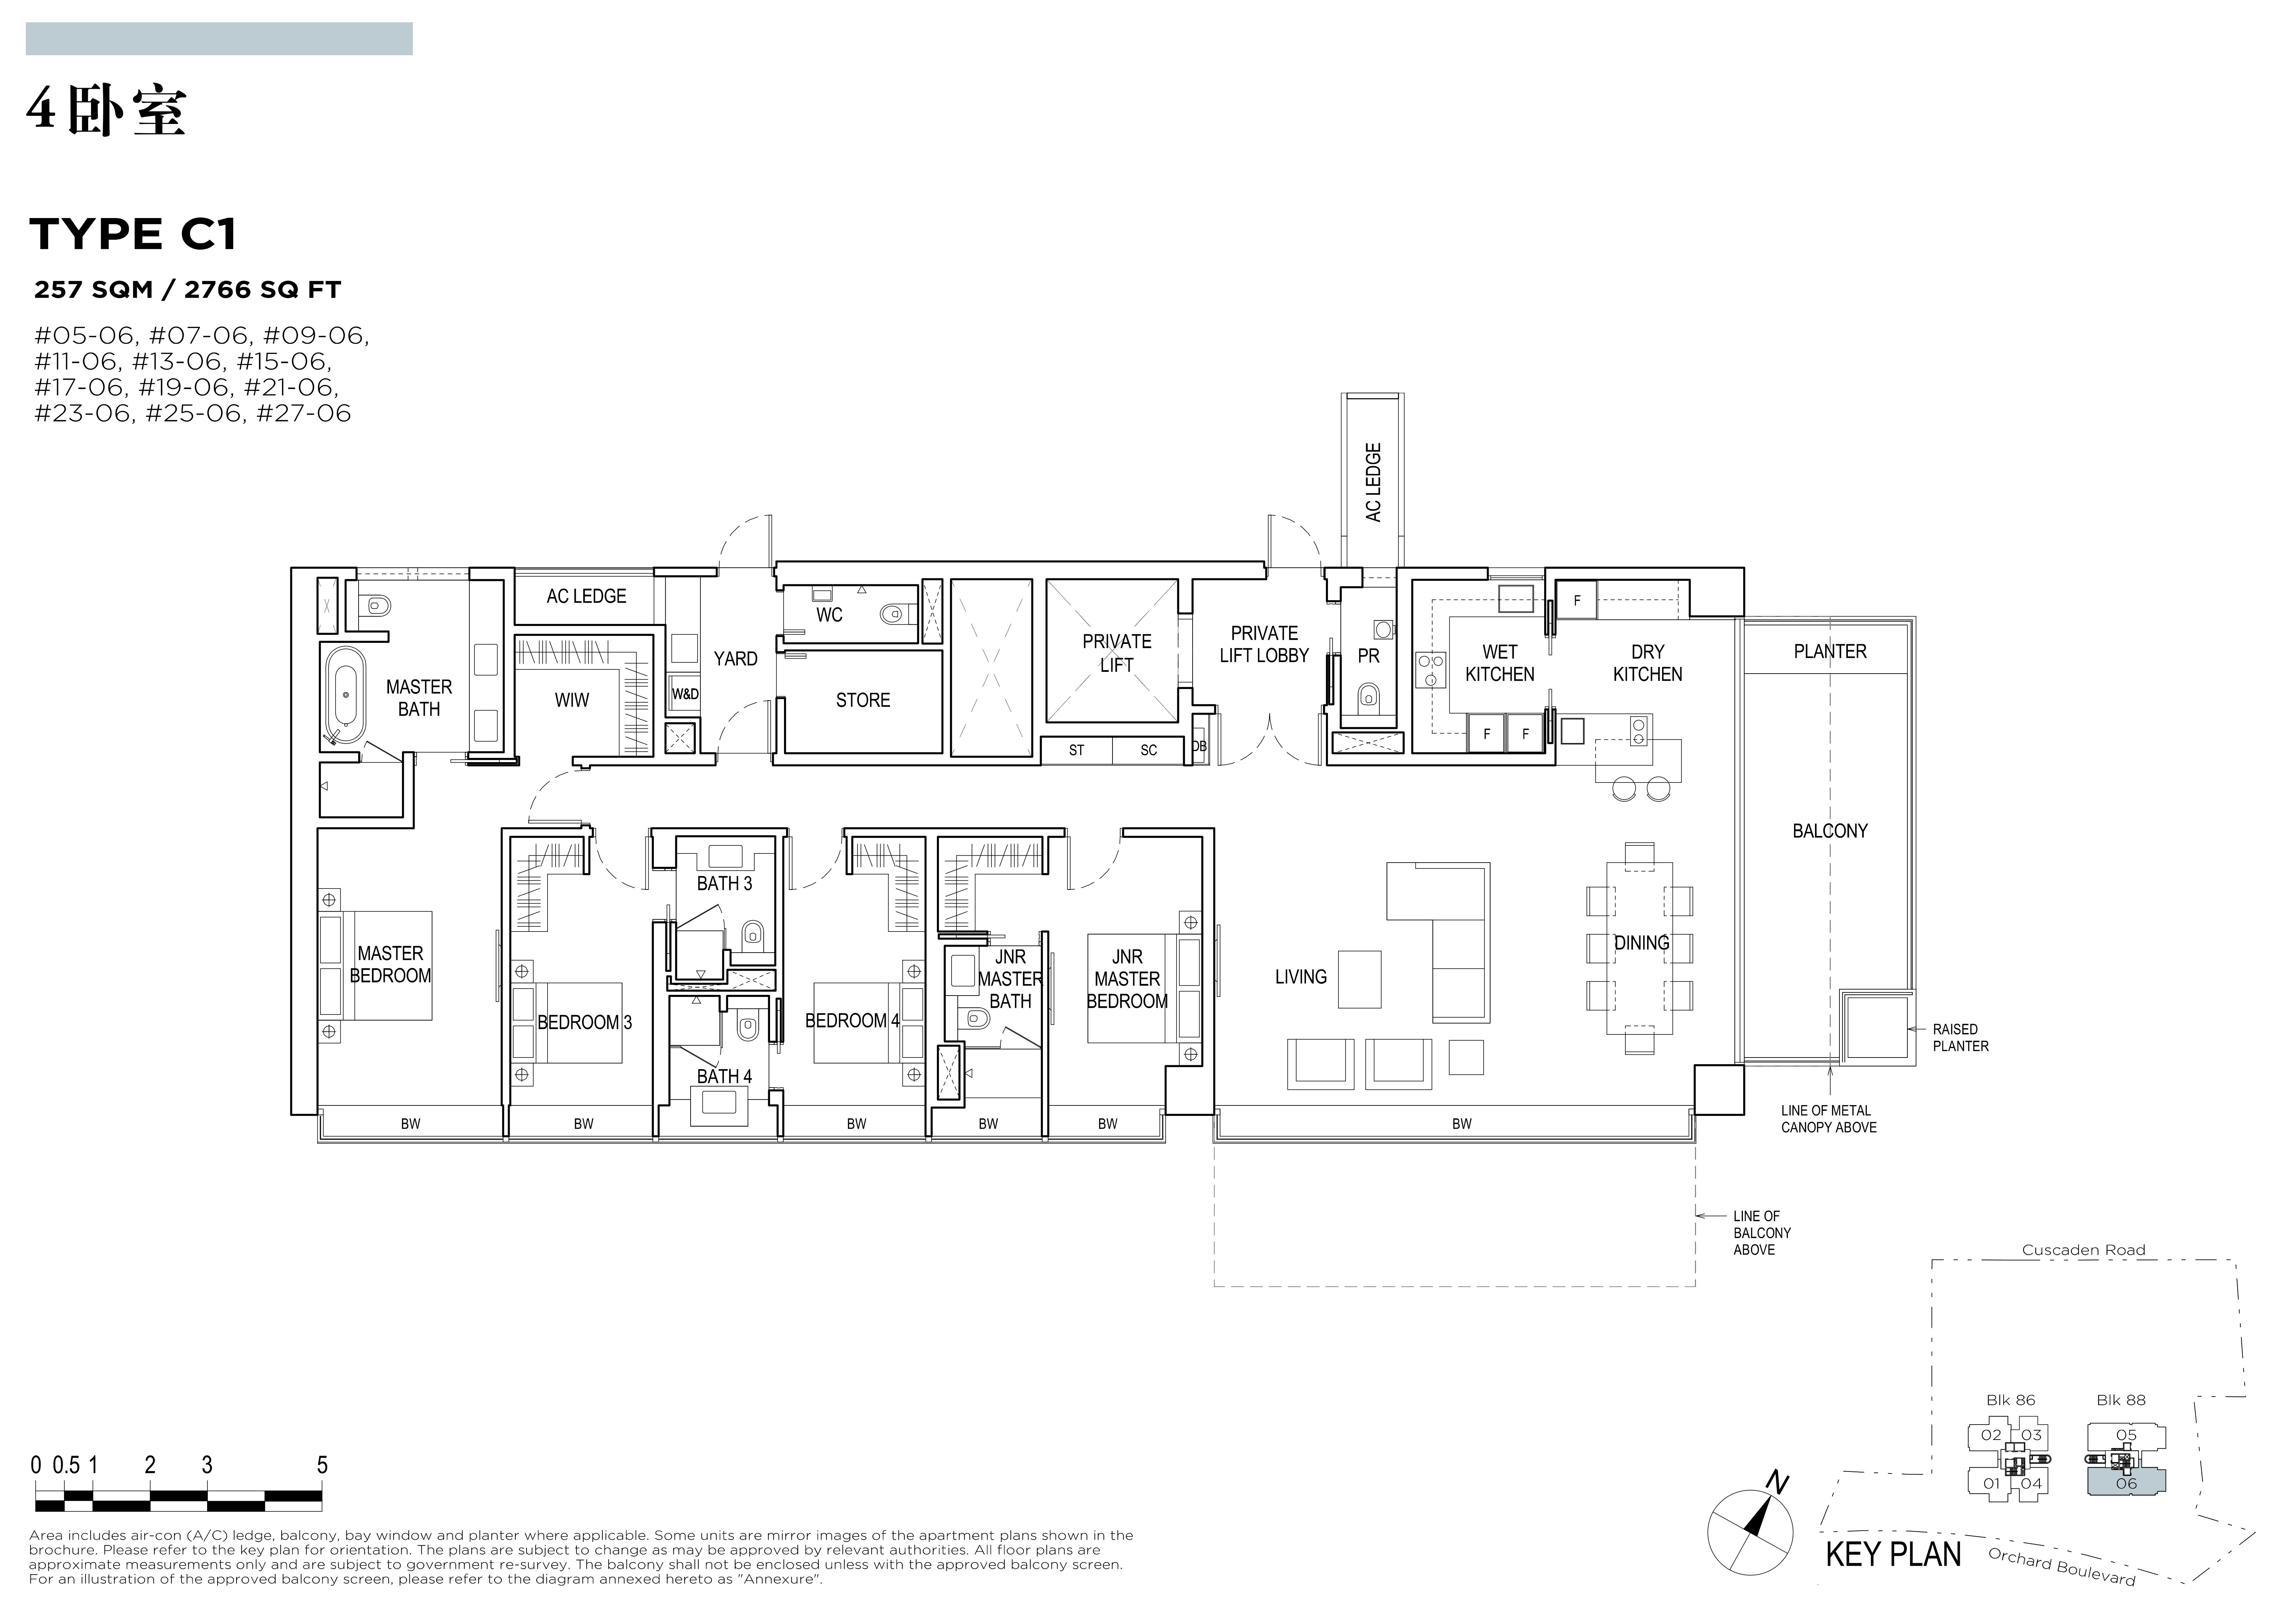 铂瑞雅居 Boulevard 88 floor plan 4 卧房 c1